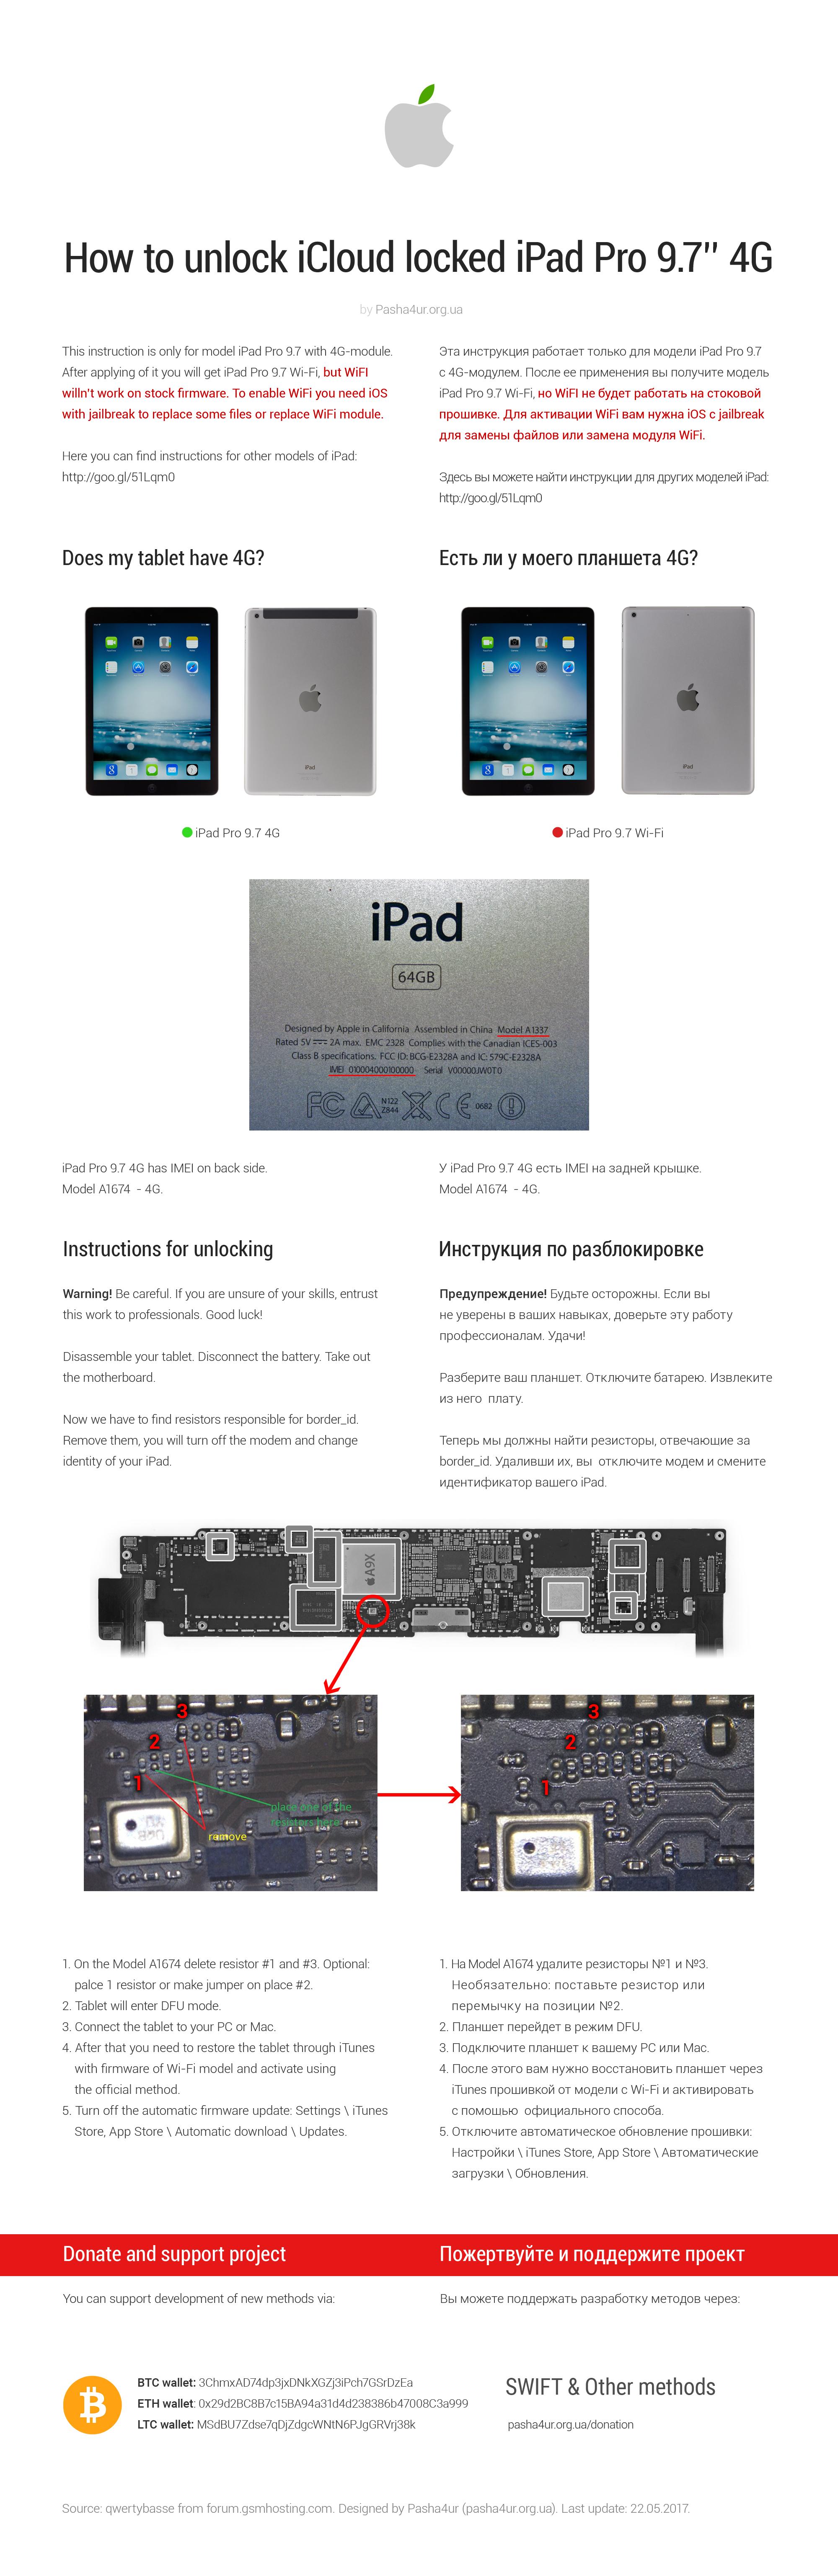 how to unlock icloud locked apple ipad 2 3 4 ipad air and air 2 rh pasha4ur org ua ipad 2 firmware update download ipad air 2 firmware update